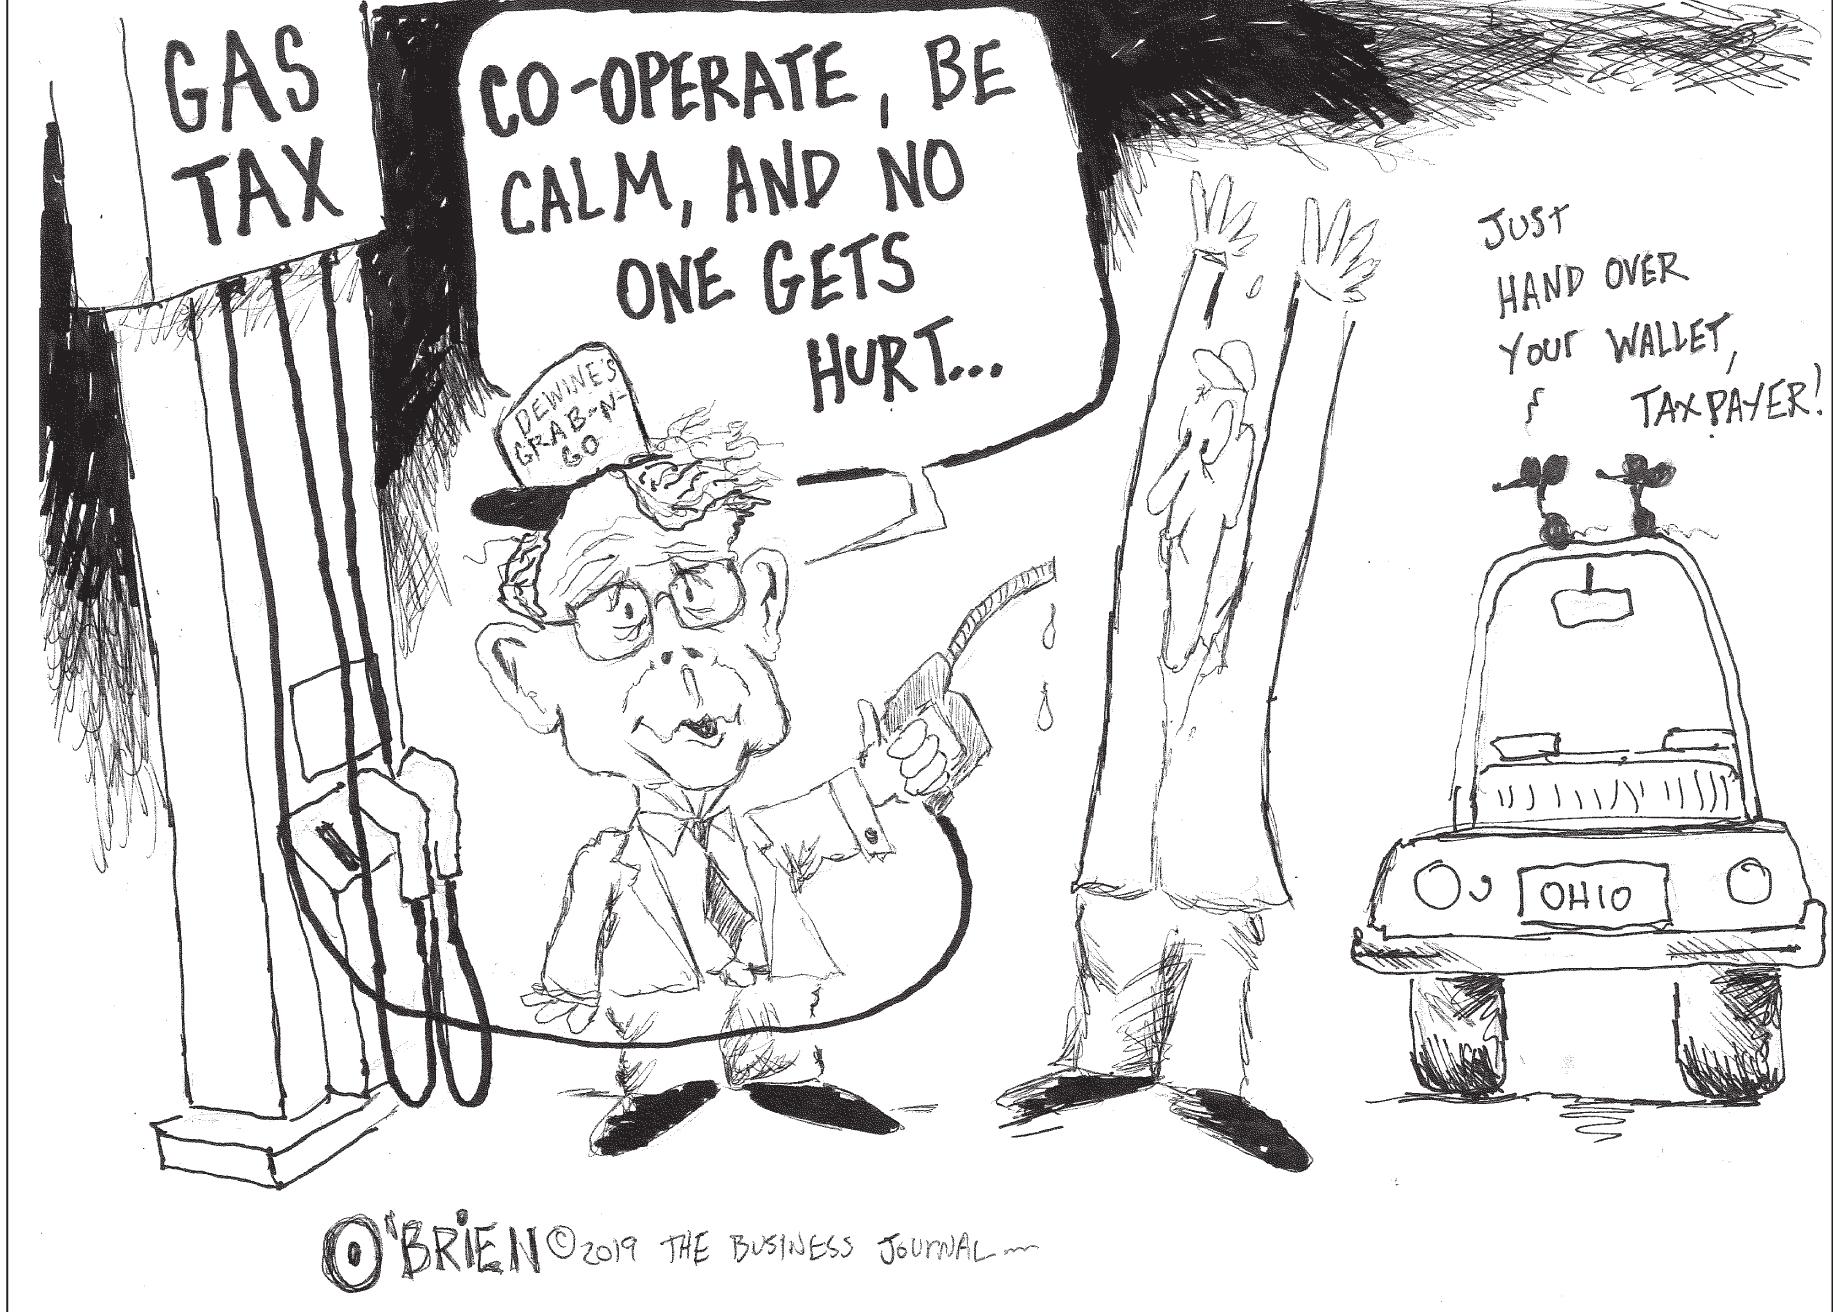 Ohio Gas Tax